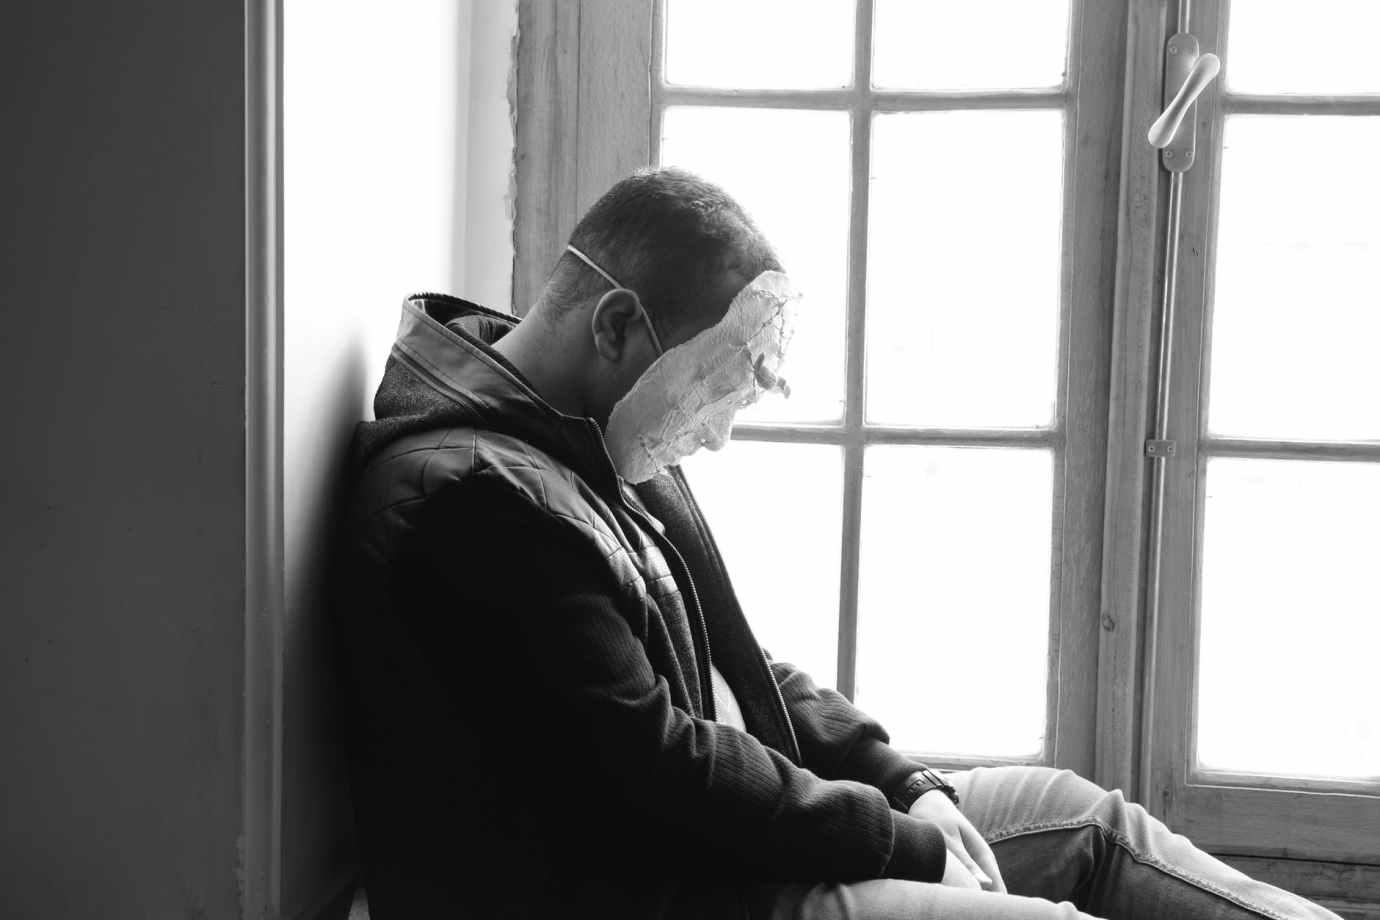 man wearing mask sitting near window panel